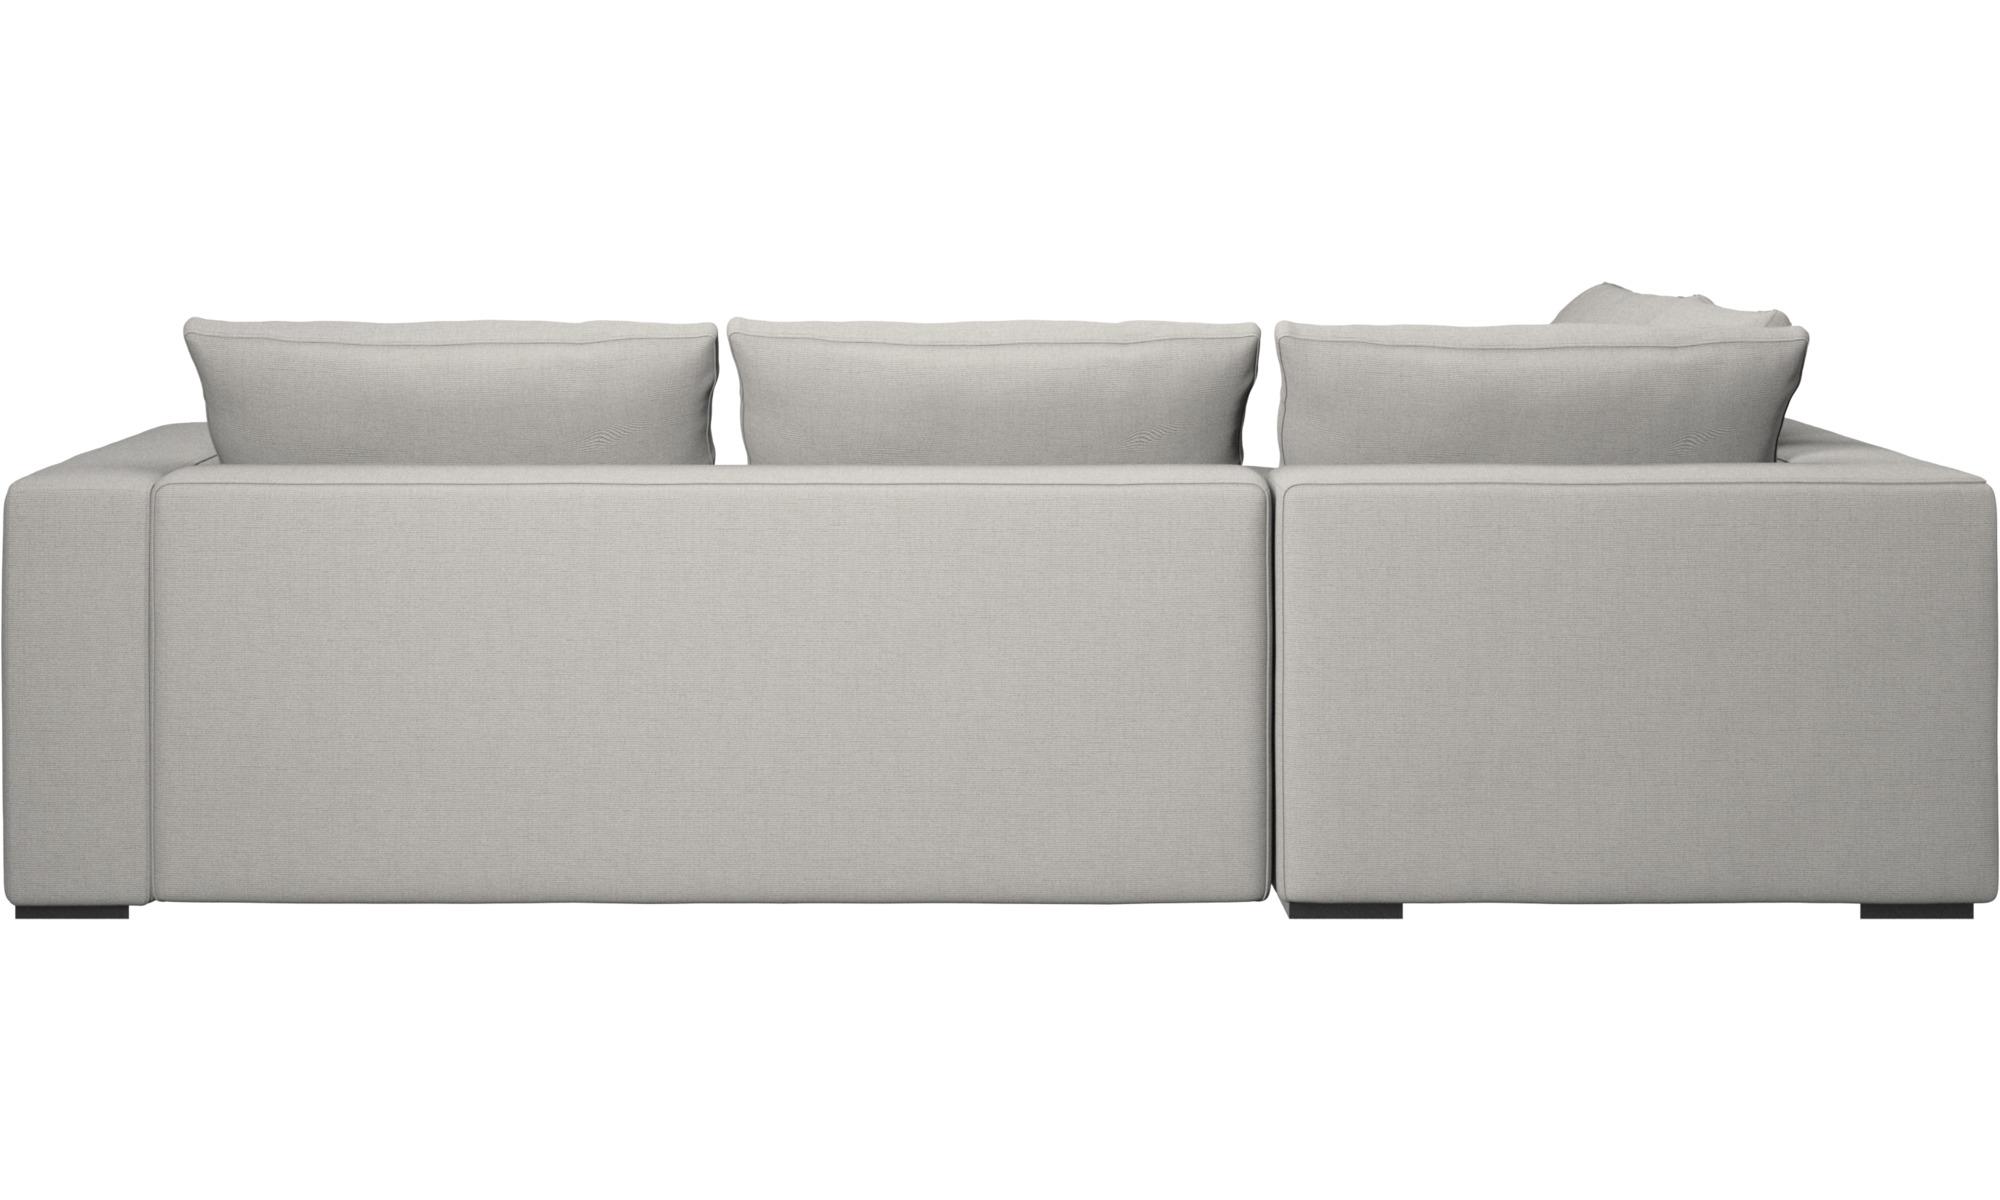 boconcept mezzo corner sofa. Black Bedroom Furniture Sets. Home Design Ideas